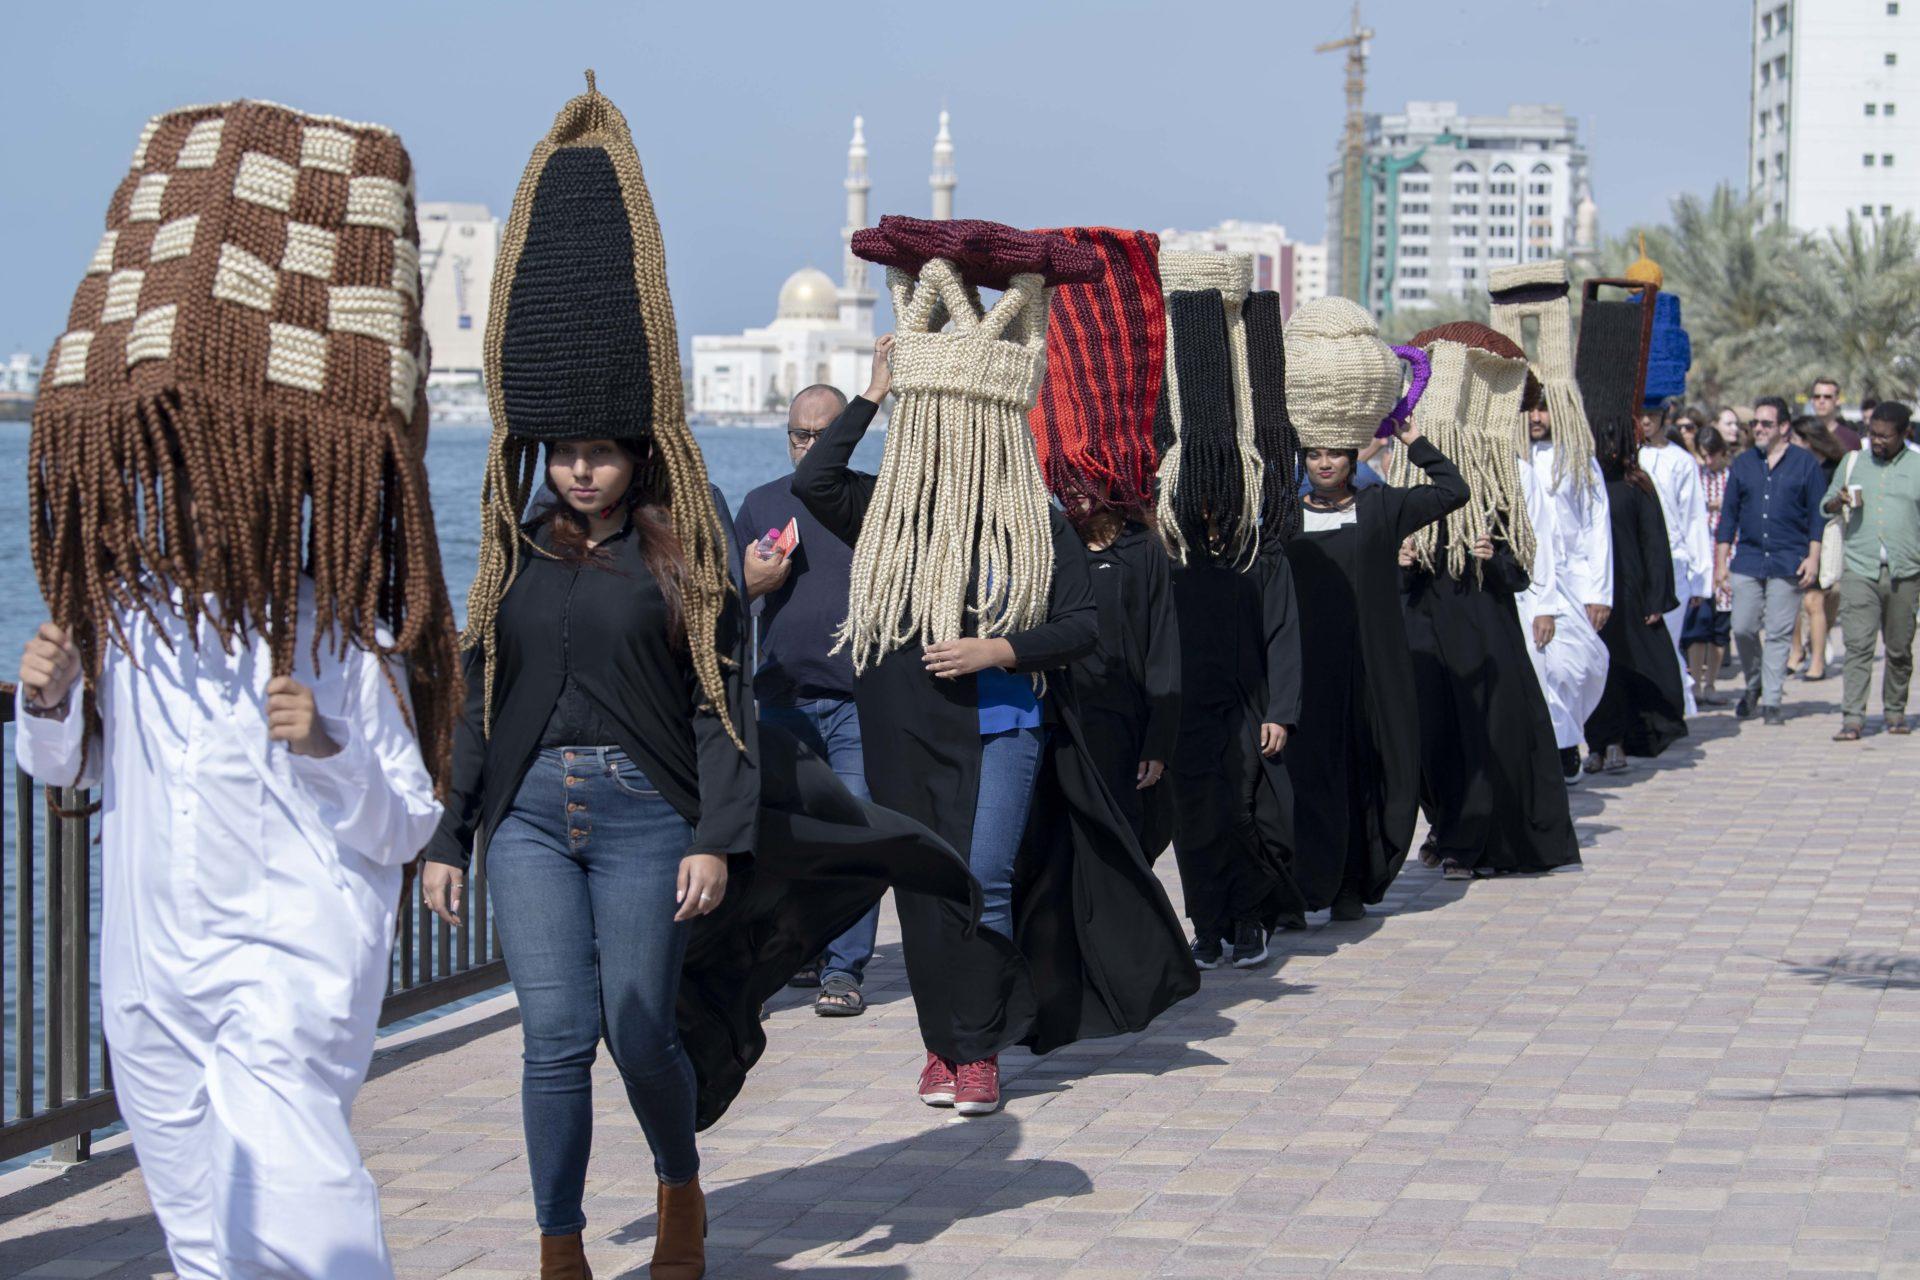 Meschac Gaba, Perruques Architecture Émirats Arabes Unis performance, March 9, 2019. Film Still Courtesy SAF